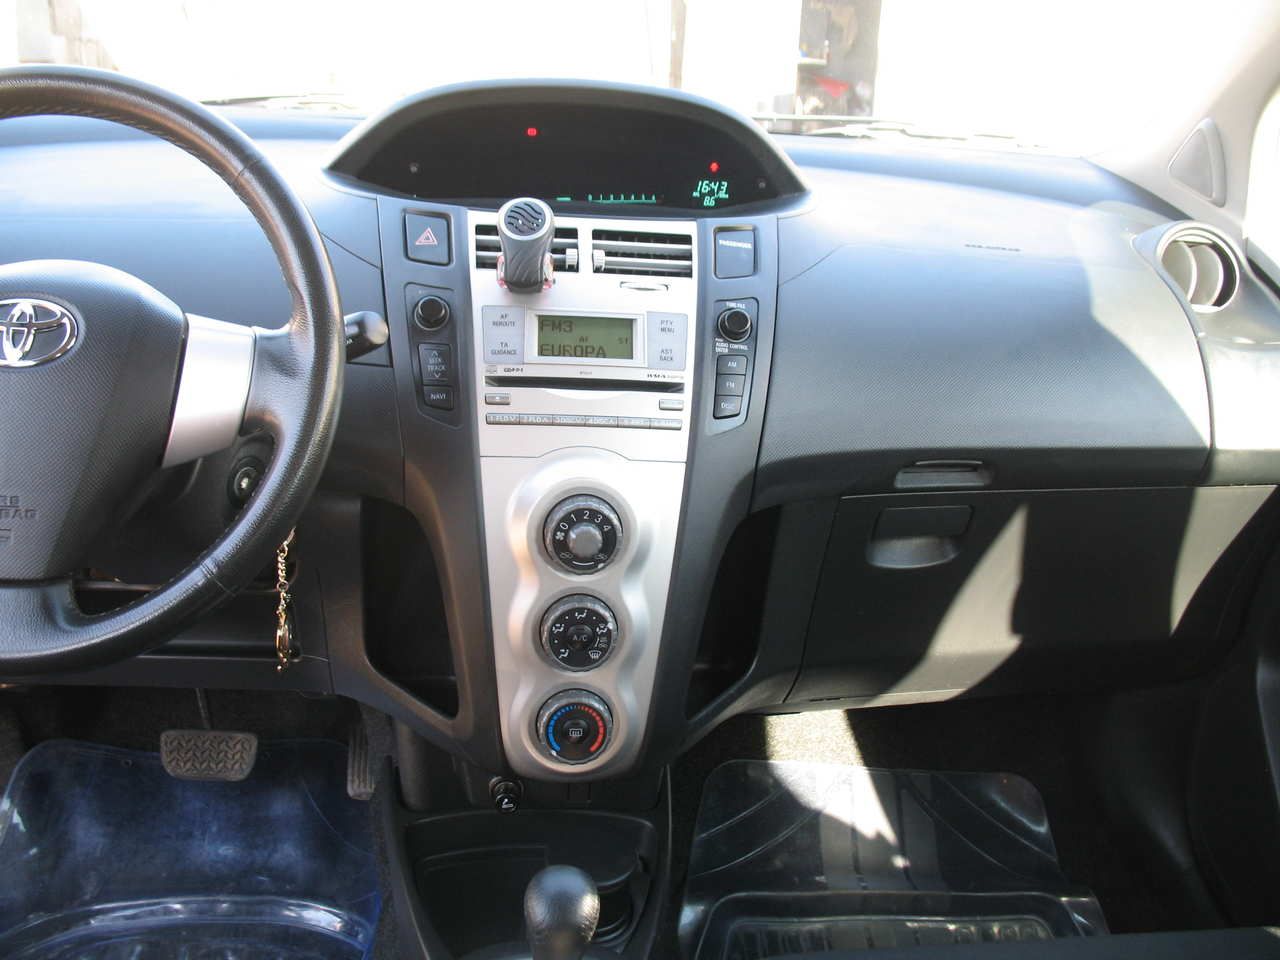 service manual car engine manuals 2008 toyota prius interior lighting interior fuse box. Black Bedroom Furniture Sets. Home Design Ideas